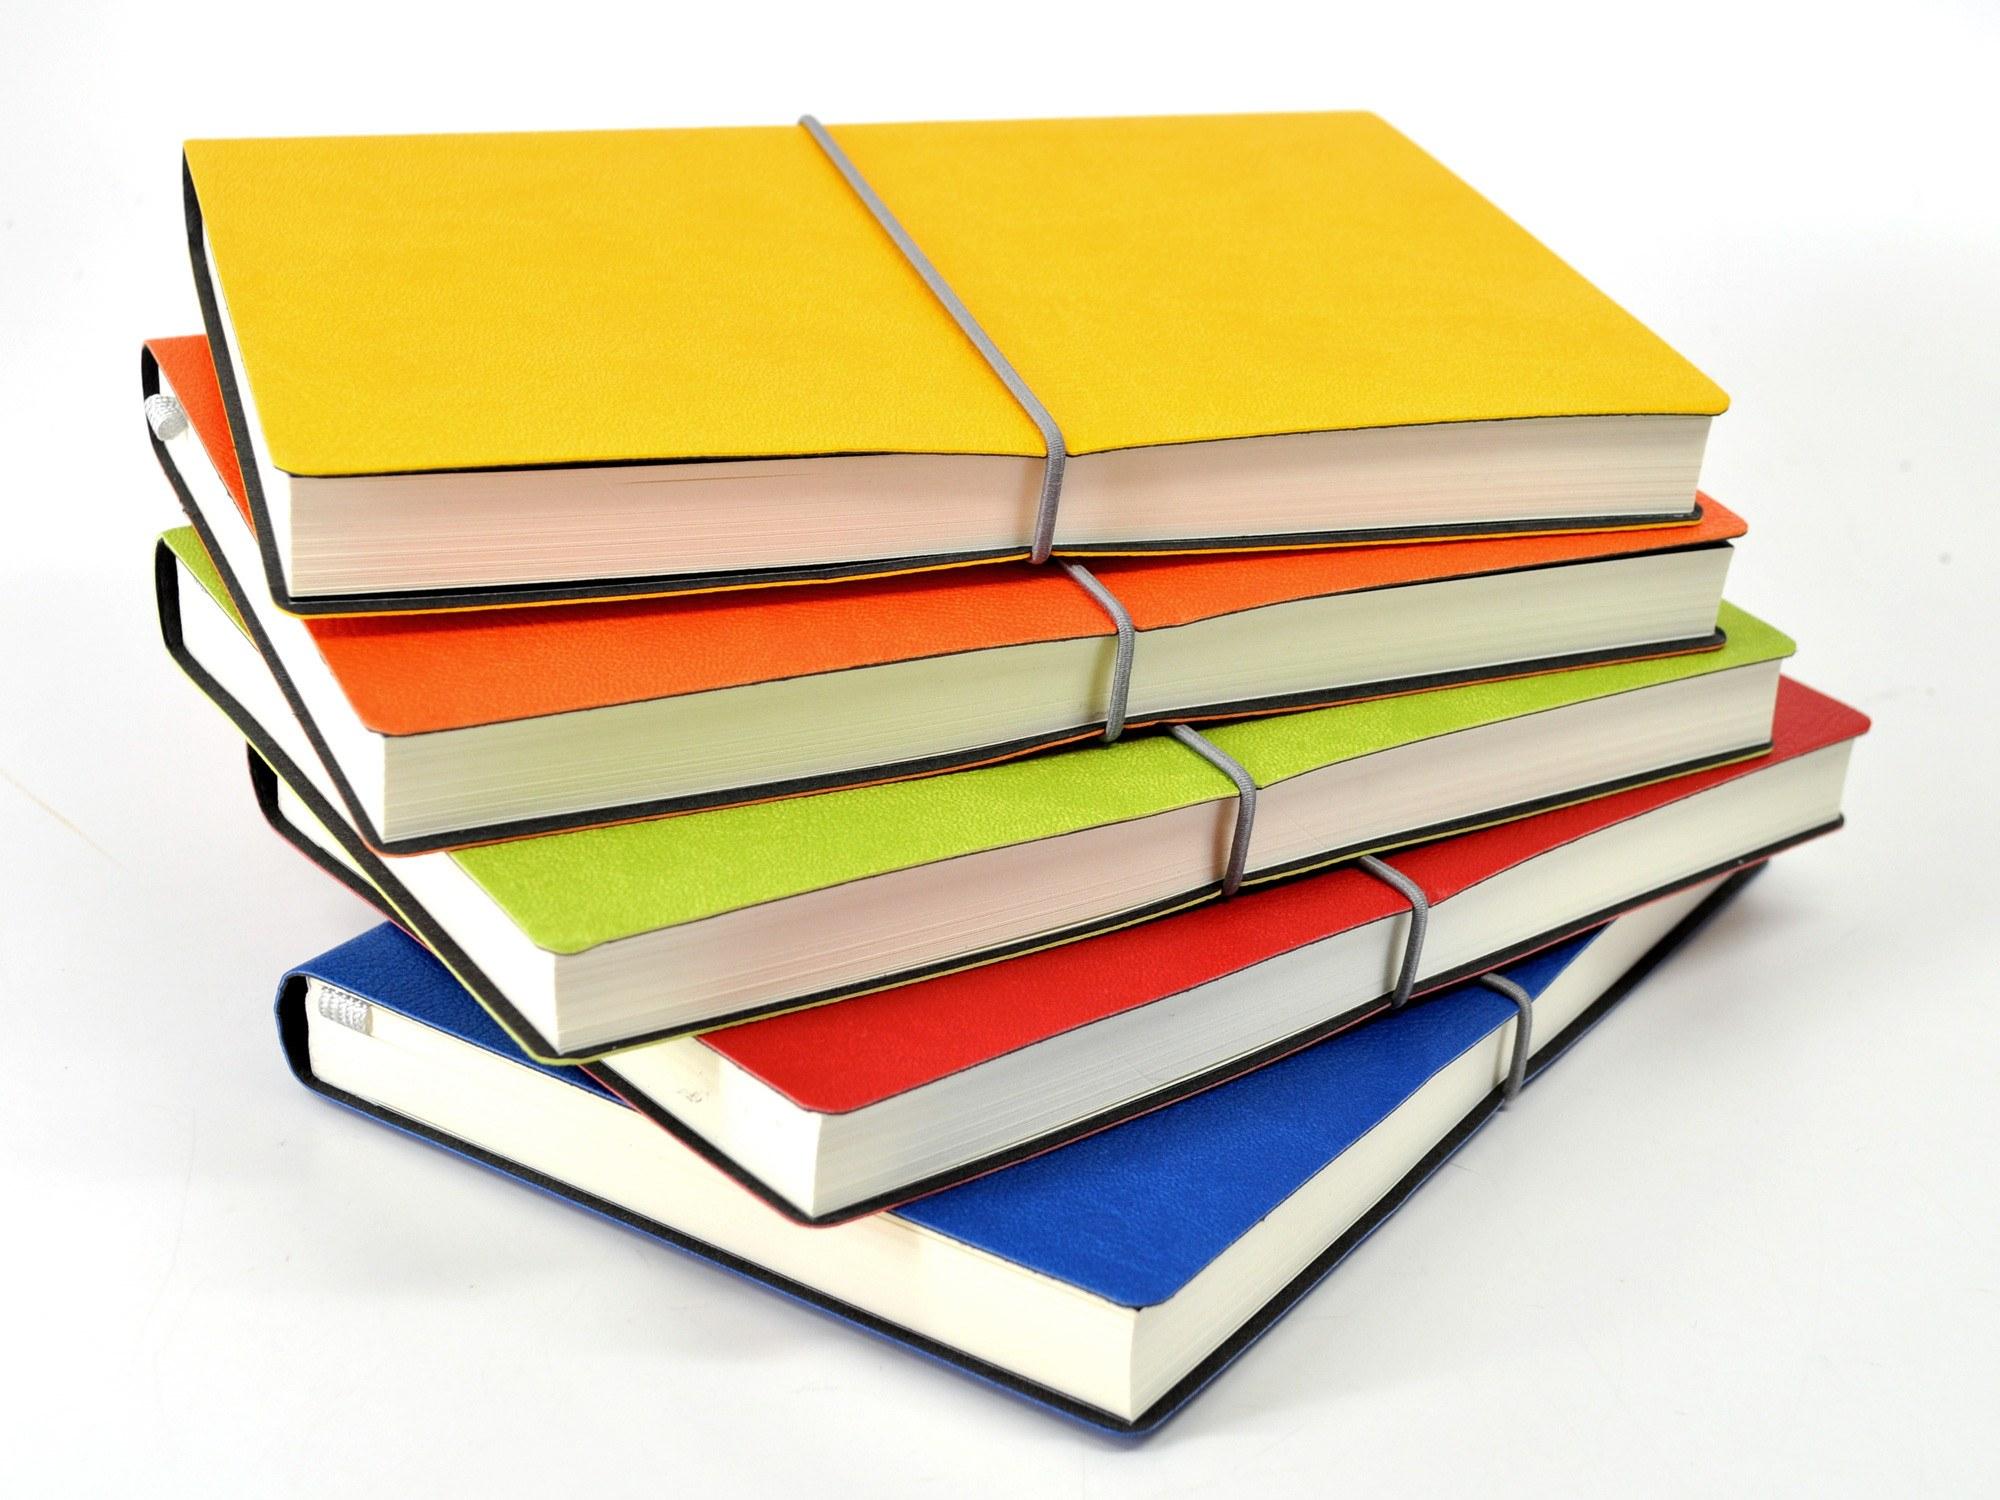 notebooks-ciak-smart-notebook-with-custom-logo-2.jpg